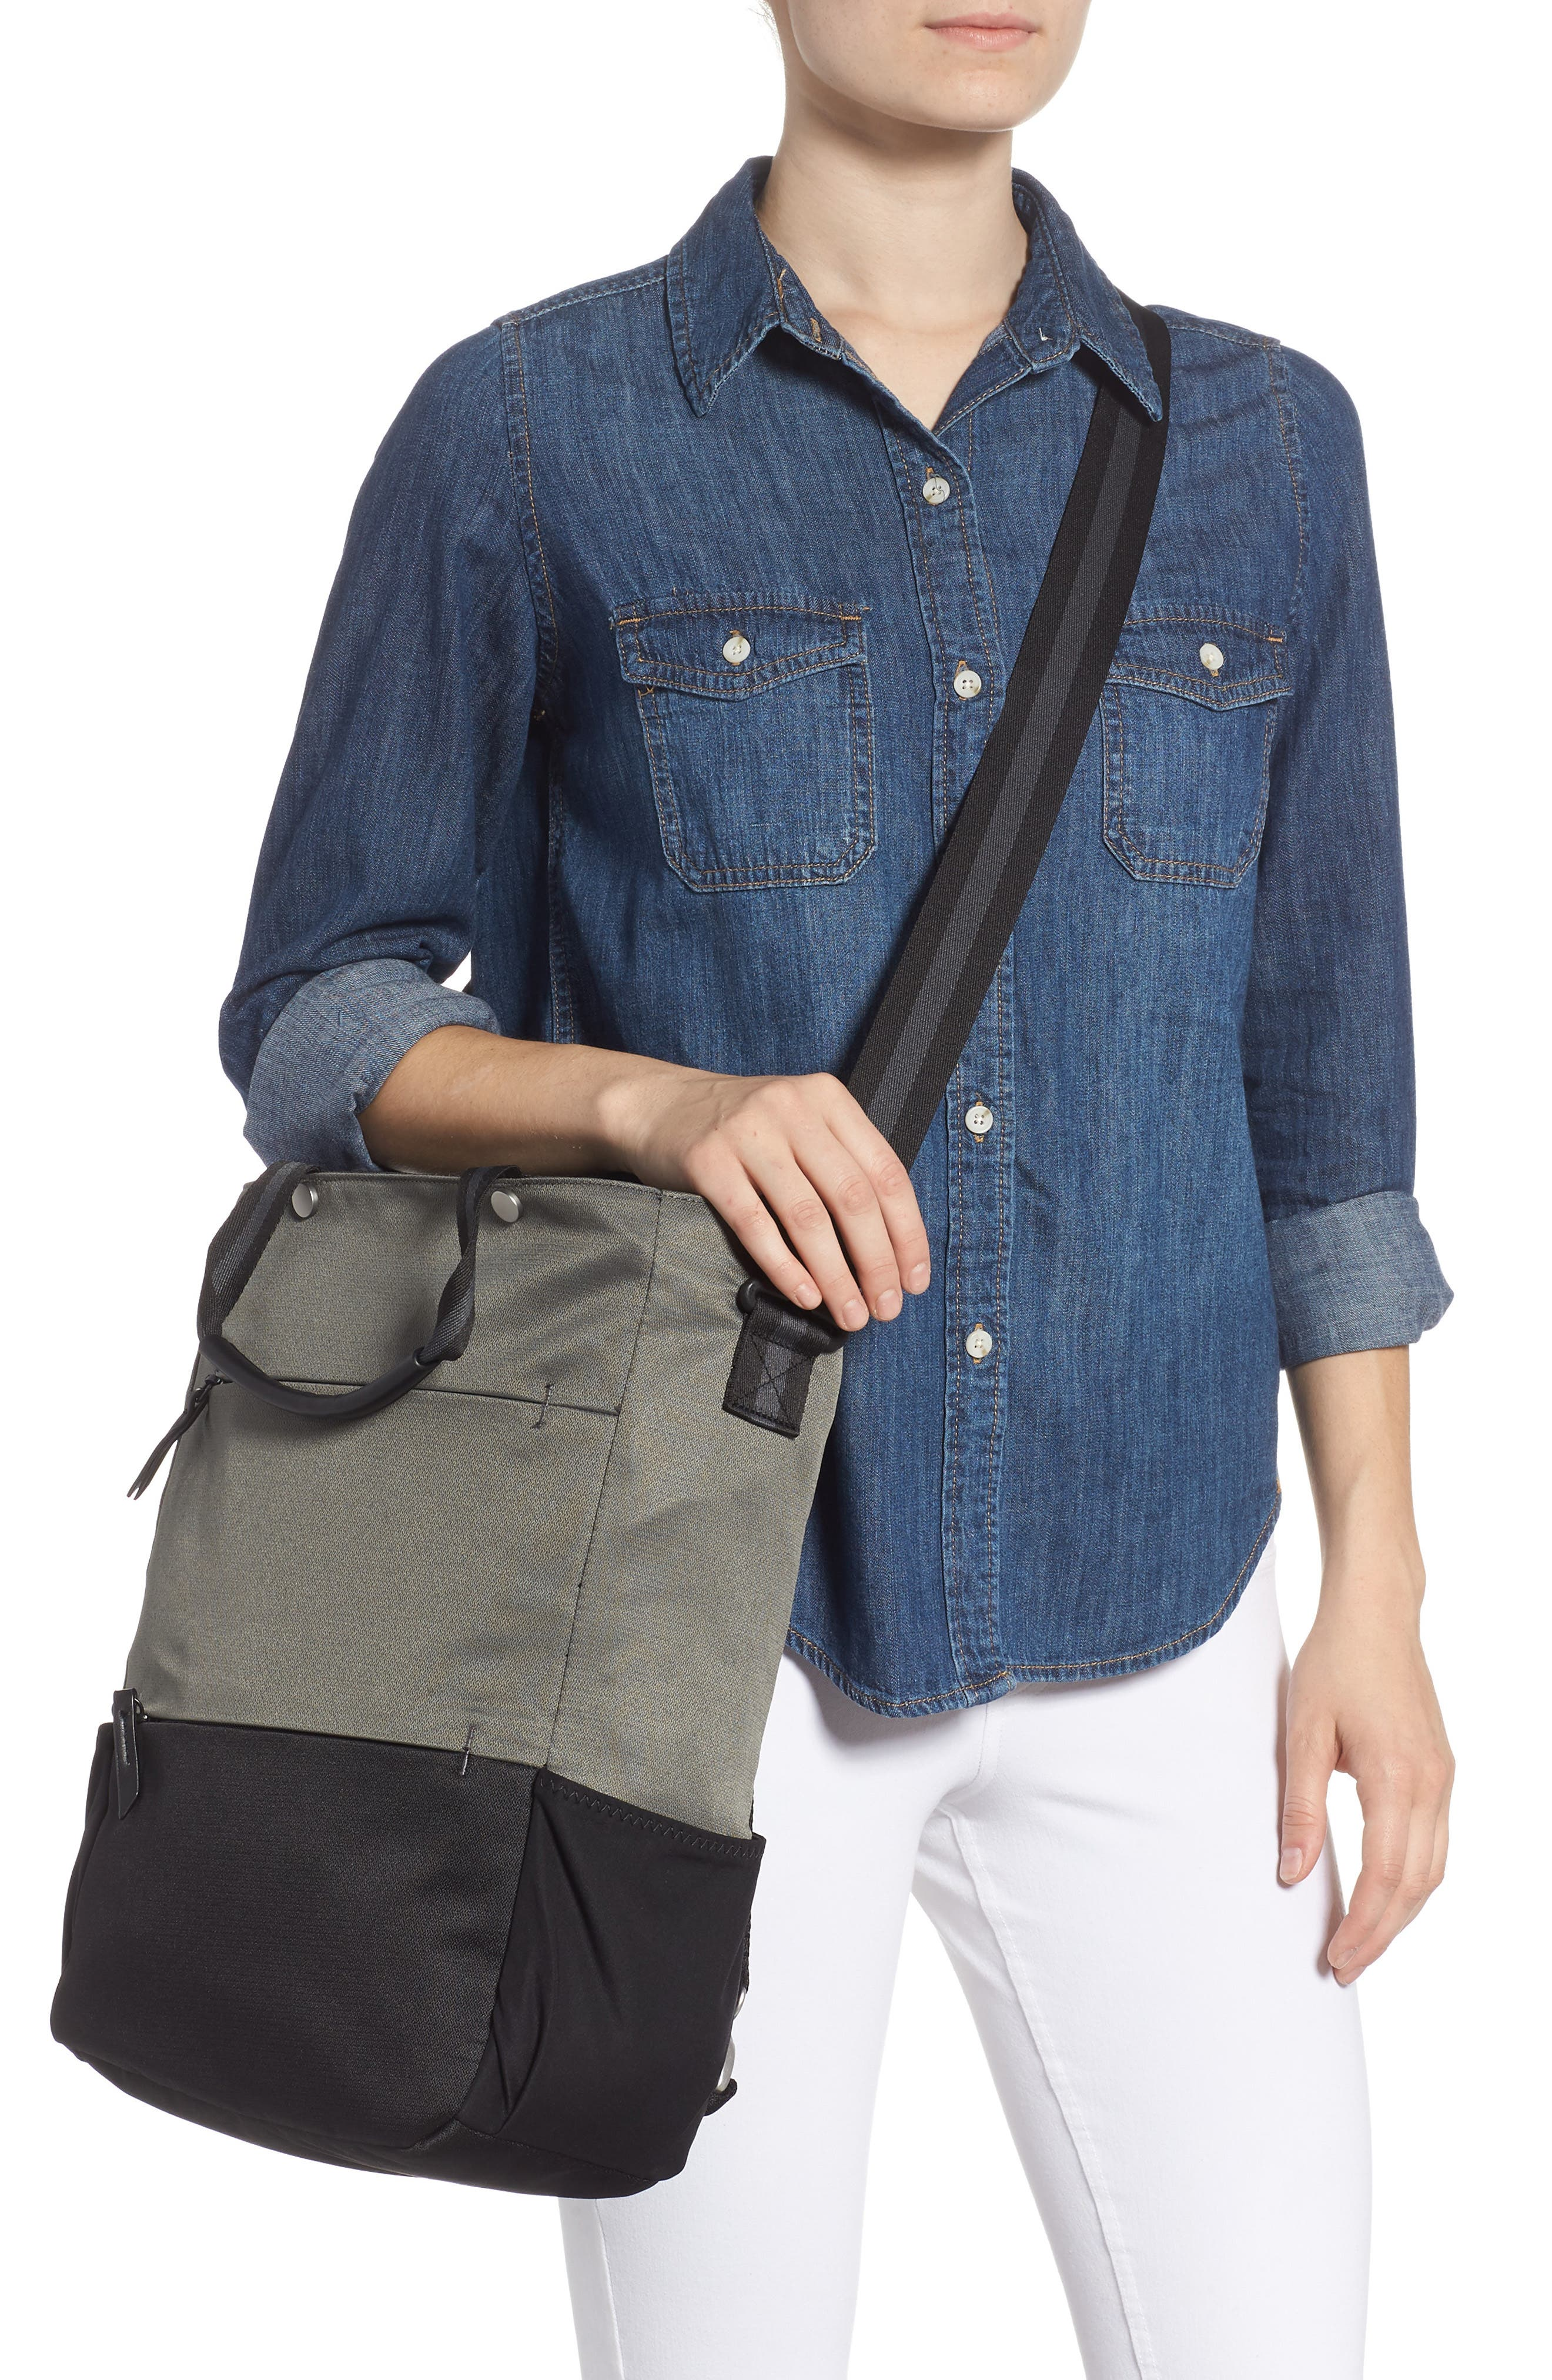 Camden RFID Convertible Backpack,                             Alternate thumbnail 4, color,                             GREY FLINT/ BLACK